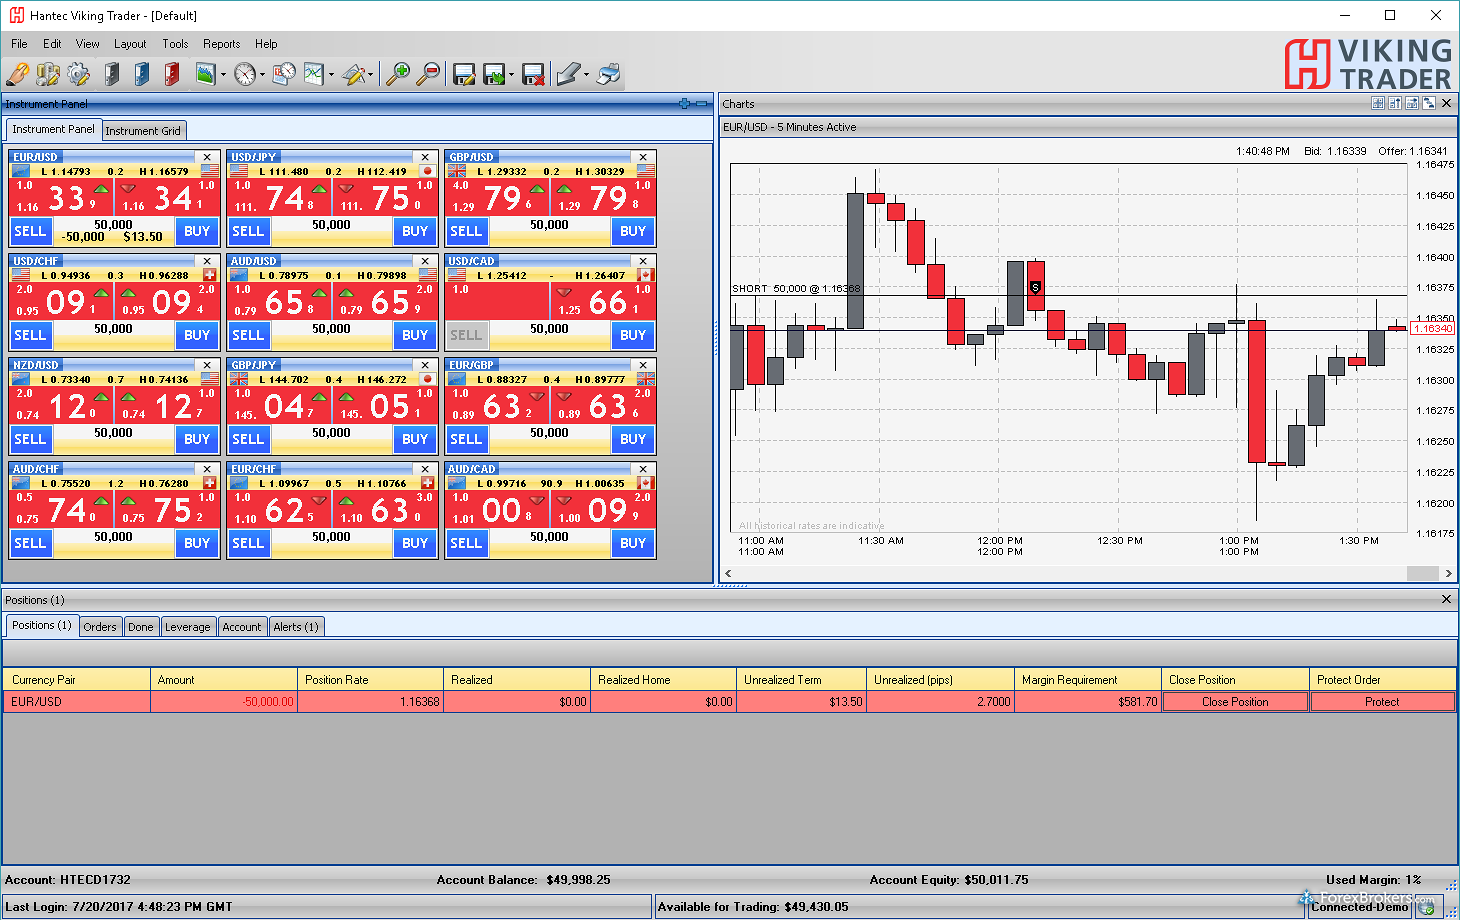 Hantec Currnex Viking Trader Desktop Windows